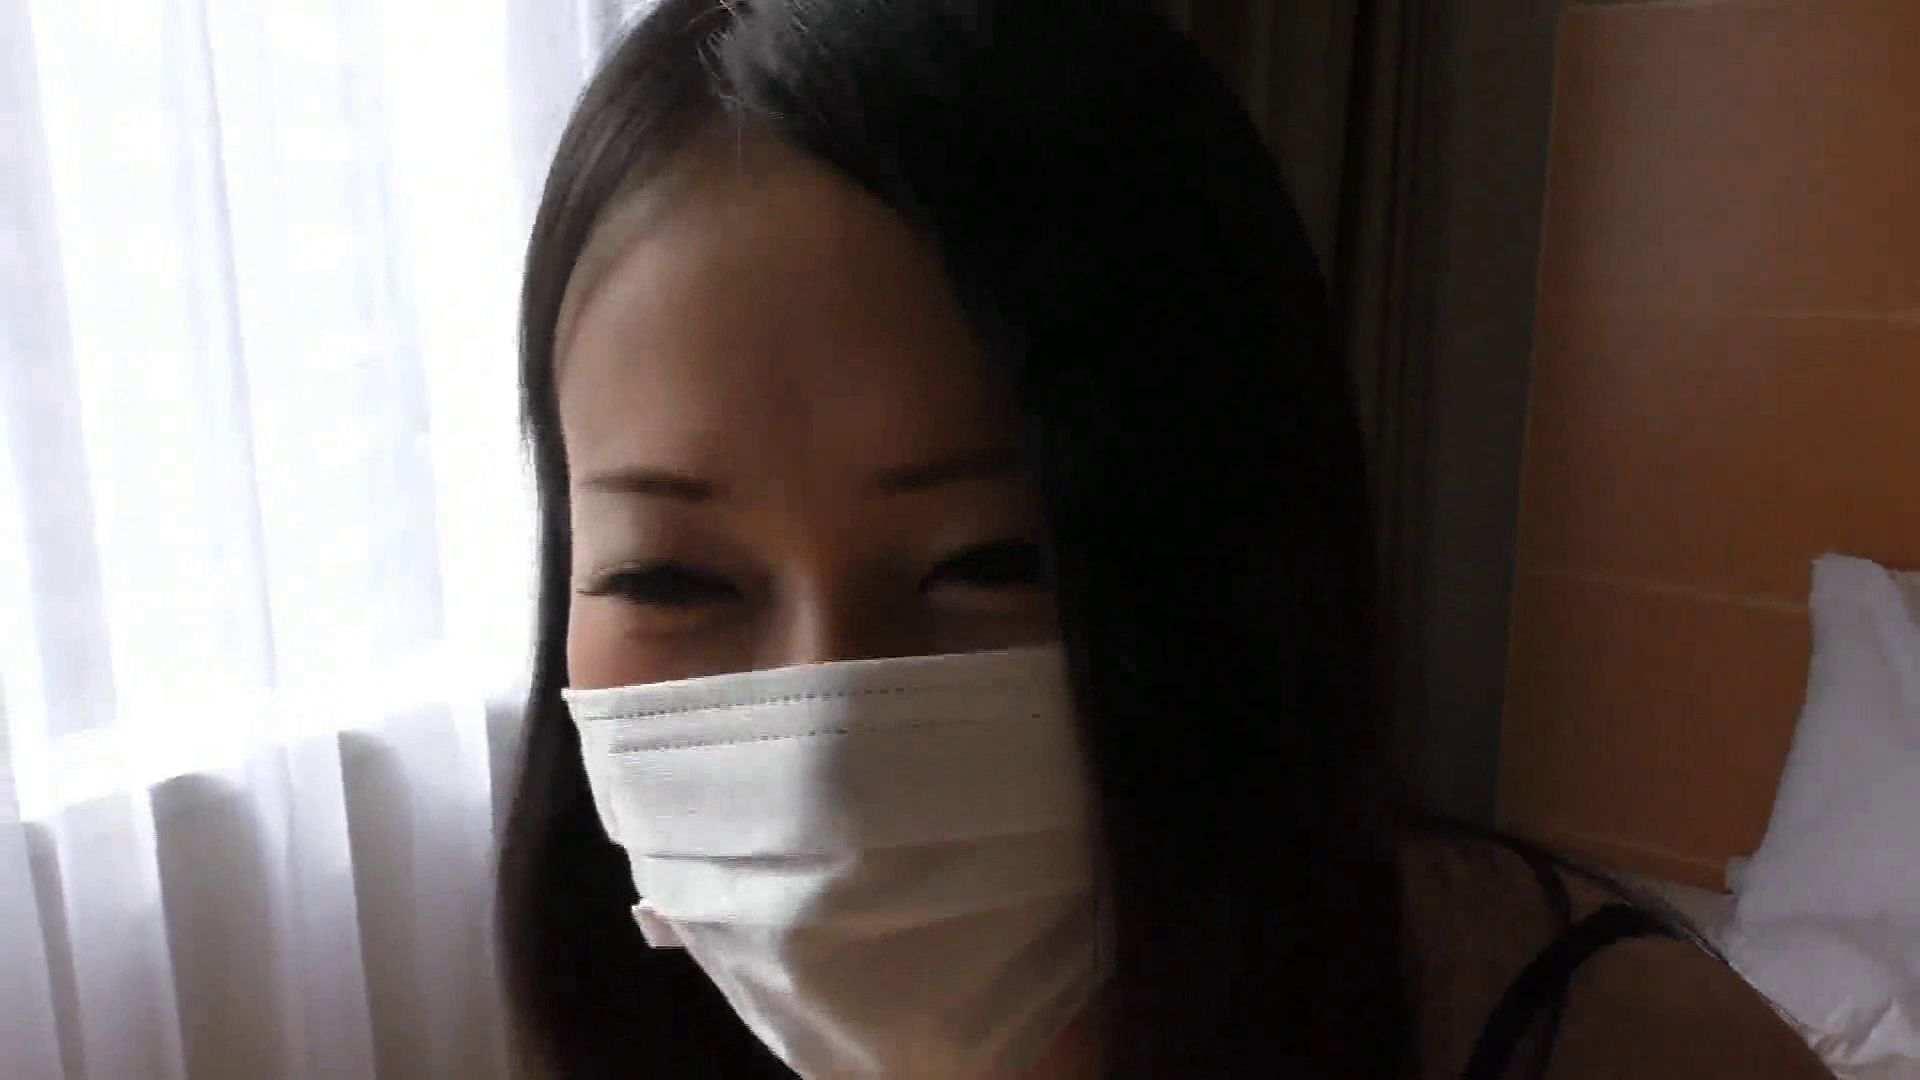 S級厳選美女ビッチガールVol.22 エッチなセックス  61画像 15